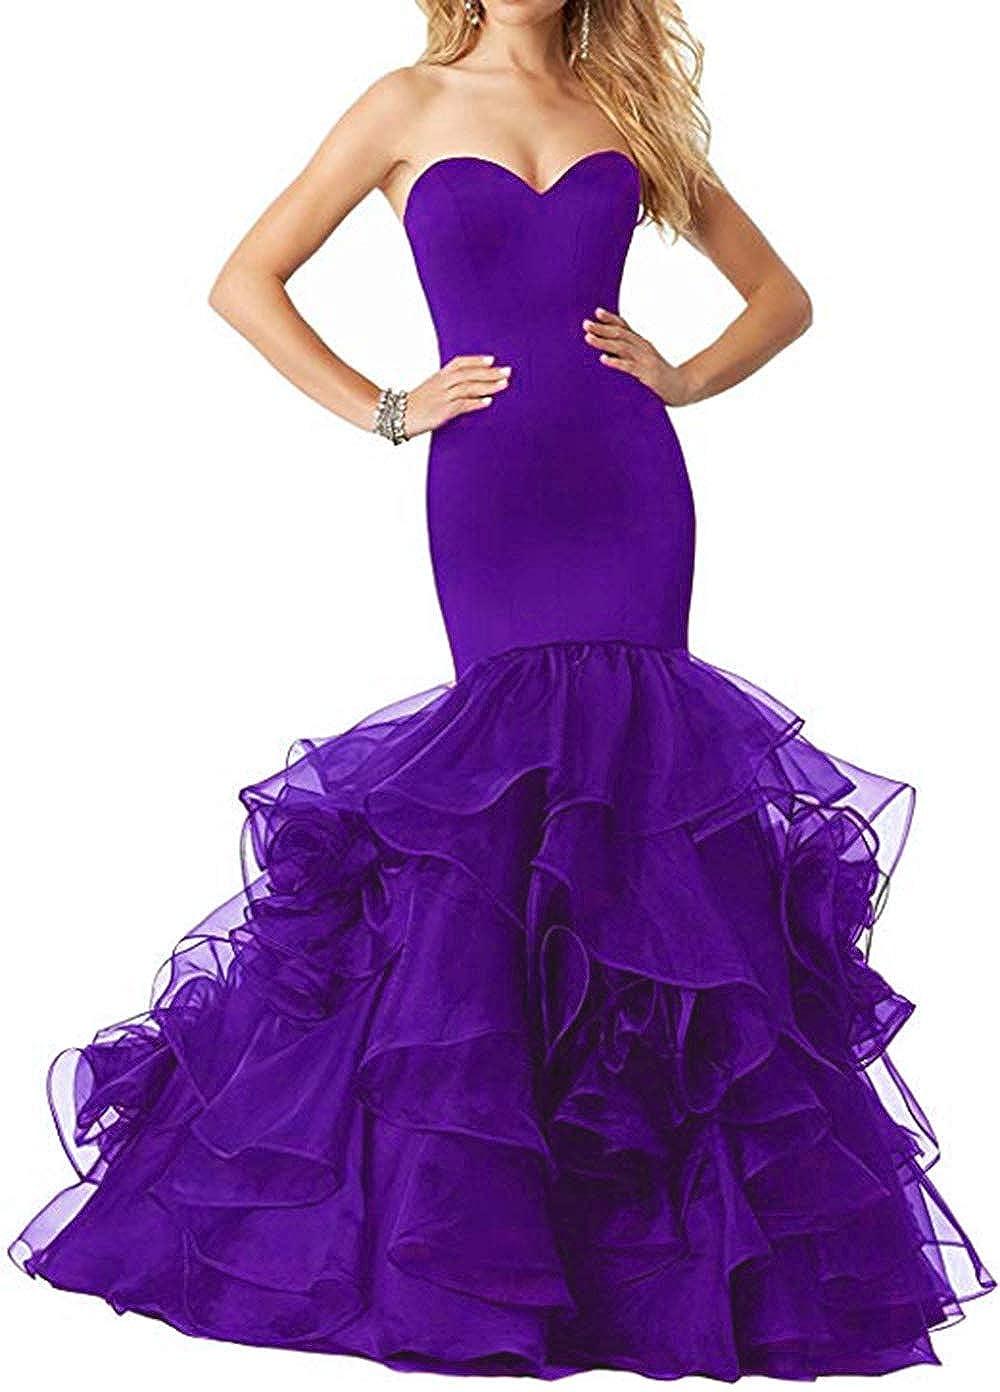 Purple Women's Sweetheart Mermaid Prom Dresses Long Strapless Ruffle Organza Formal Evening Ball Gowns 2019